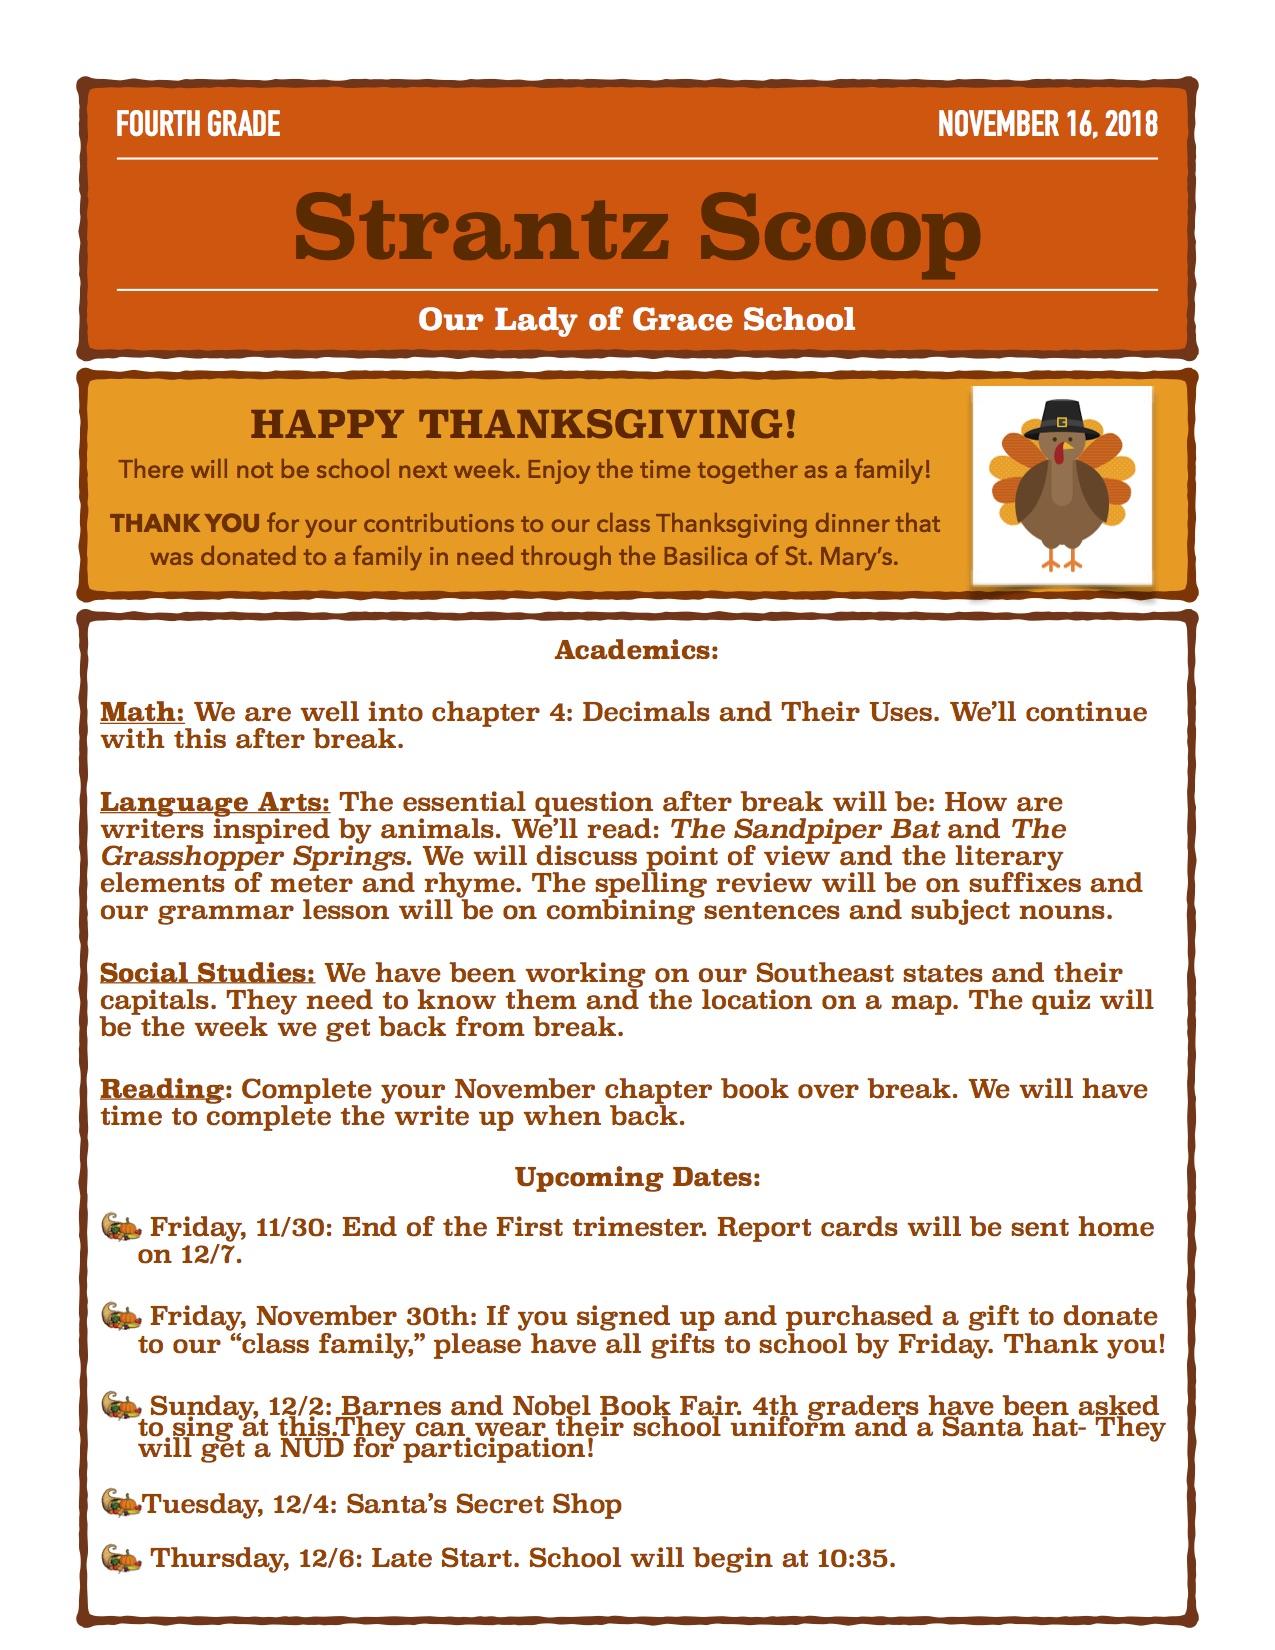 Strantz Scoop11-16-18.jpg